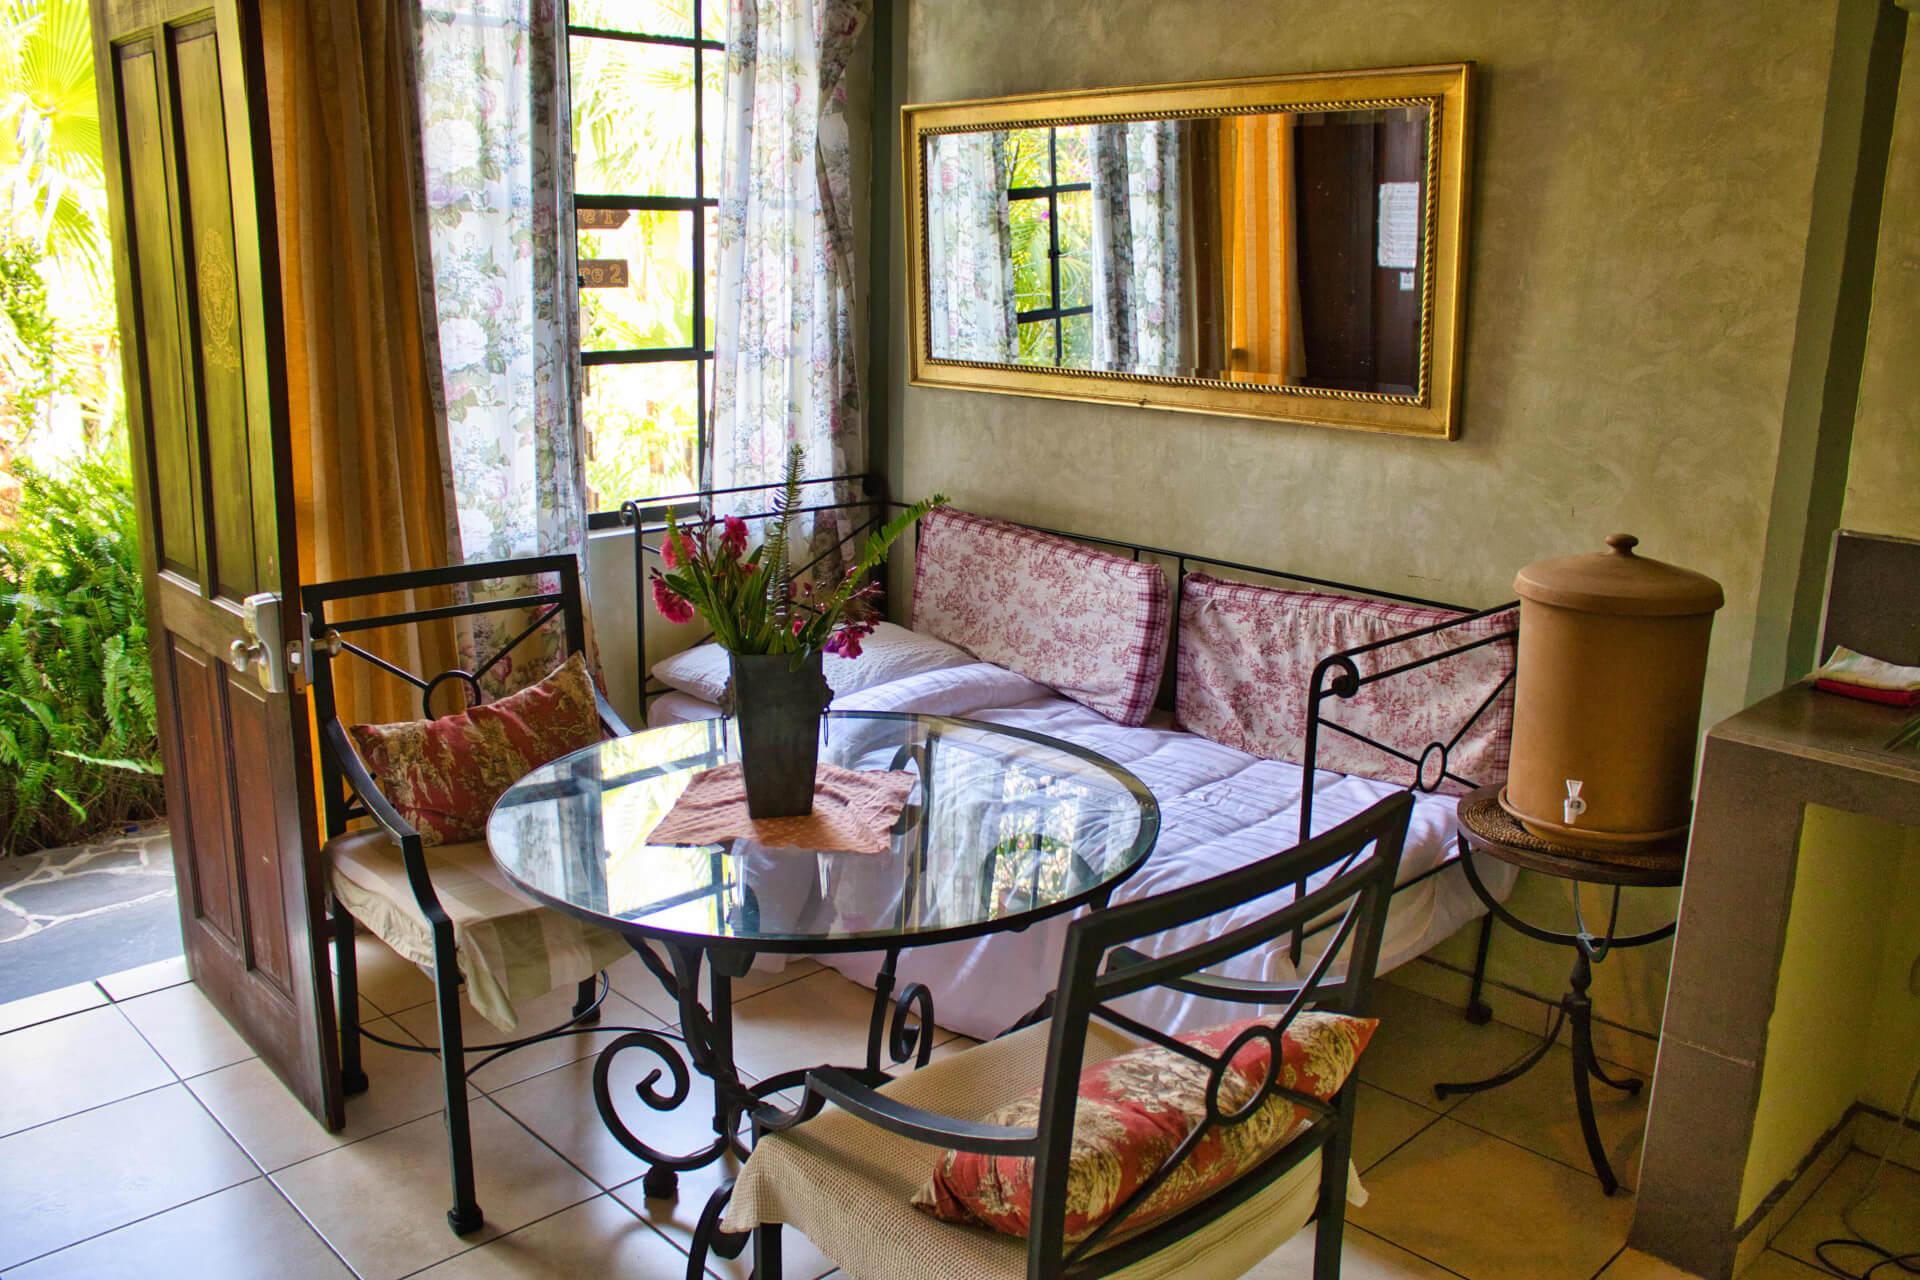 "<span  class=""uc_style_uc_tiles_grid_image_elementor_uc_items_attribute_title"" style=""color:#ffffff;"">Casa Lobo Bungalows - La Torre 2 - Sofa Bed</span>"